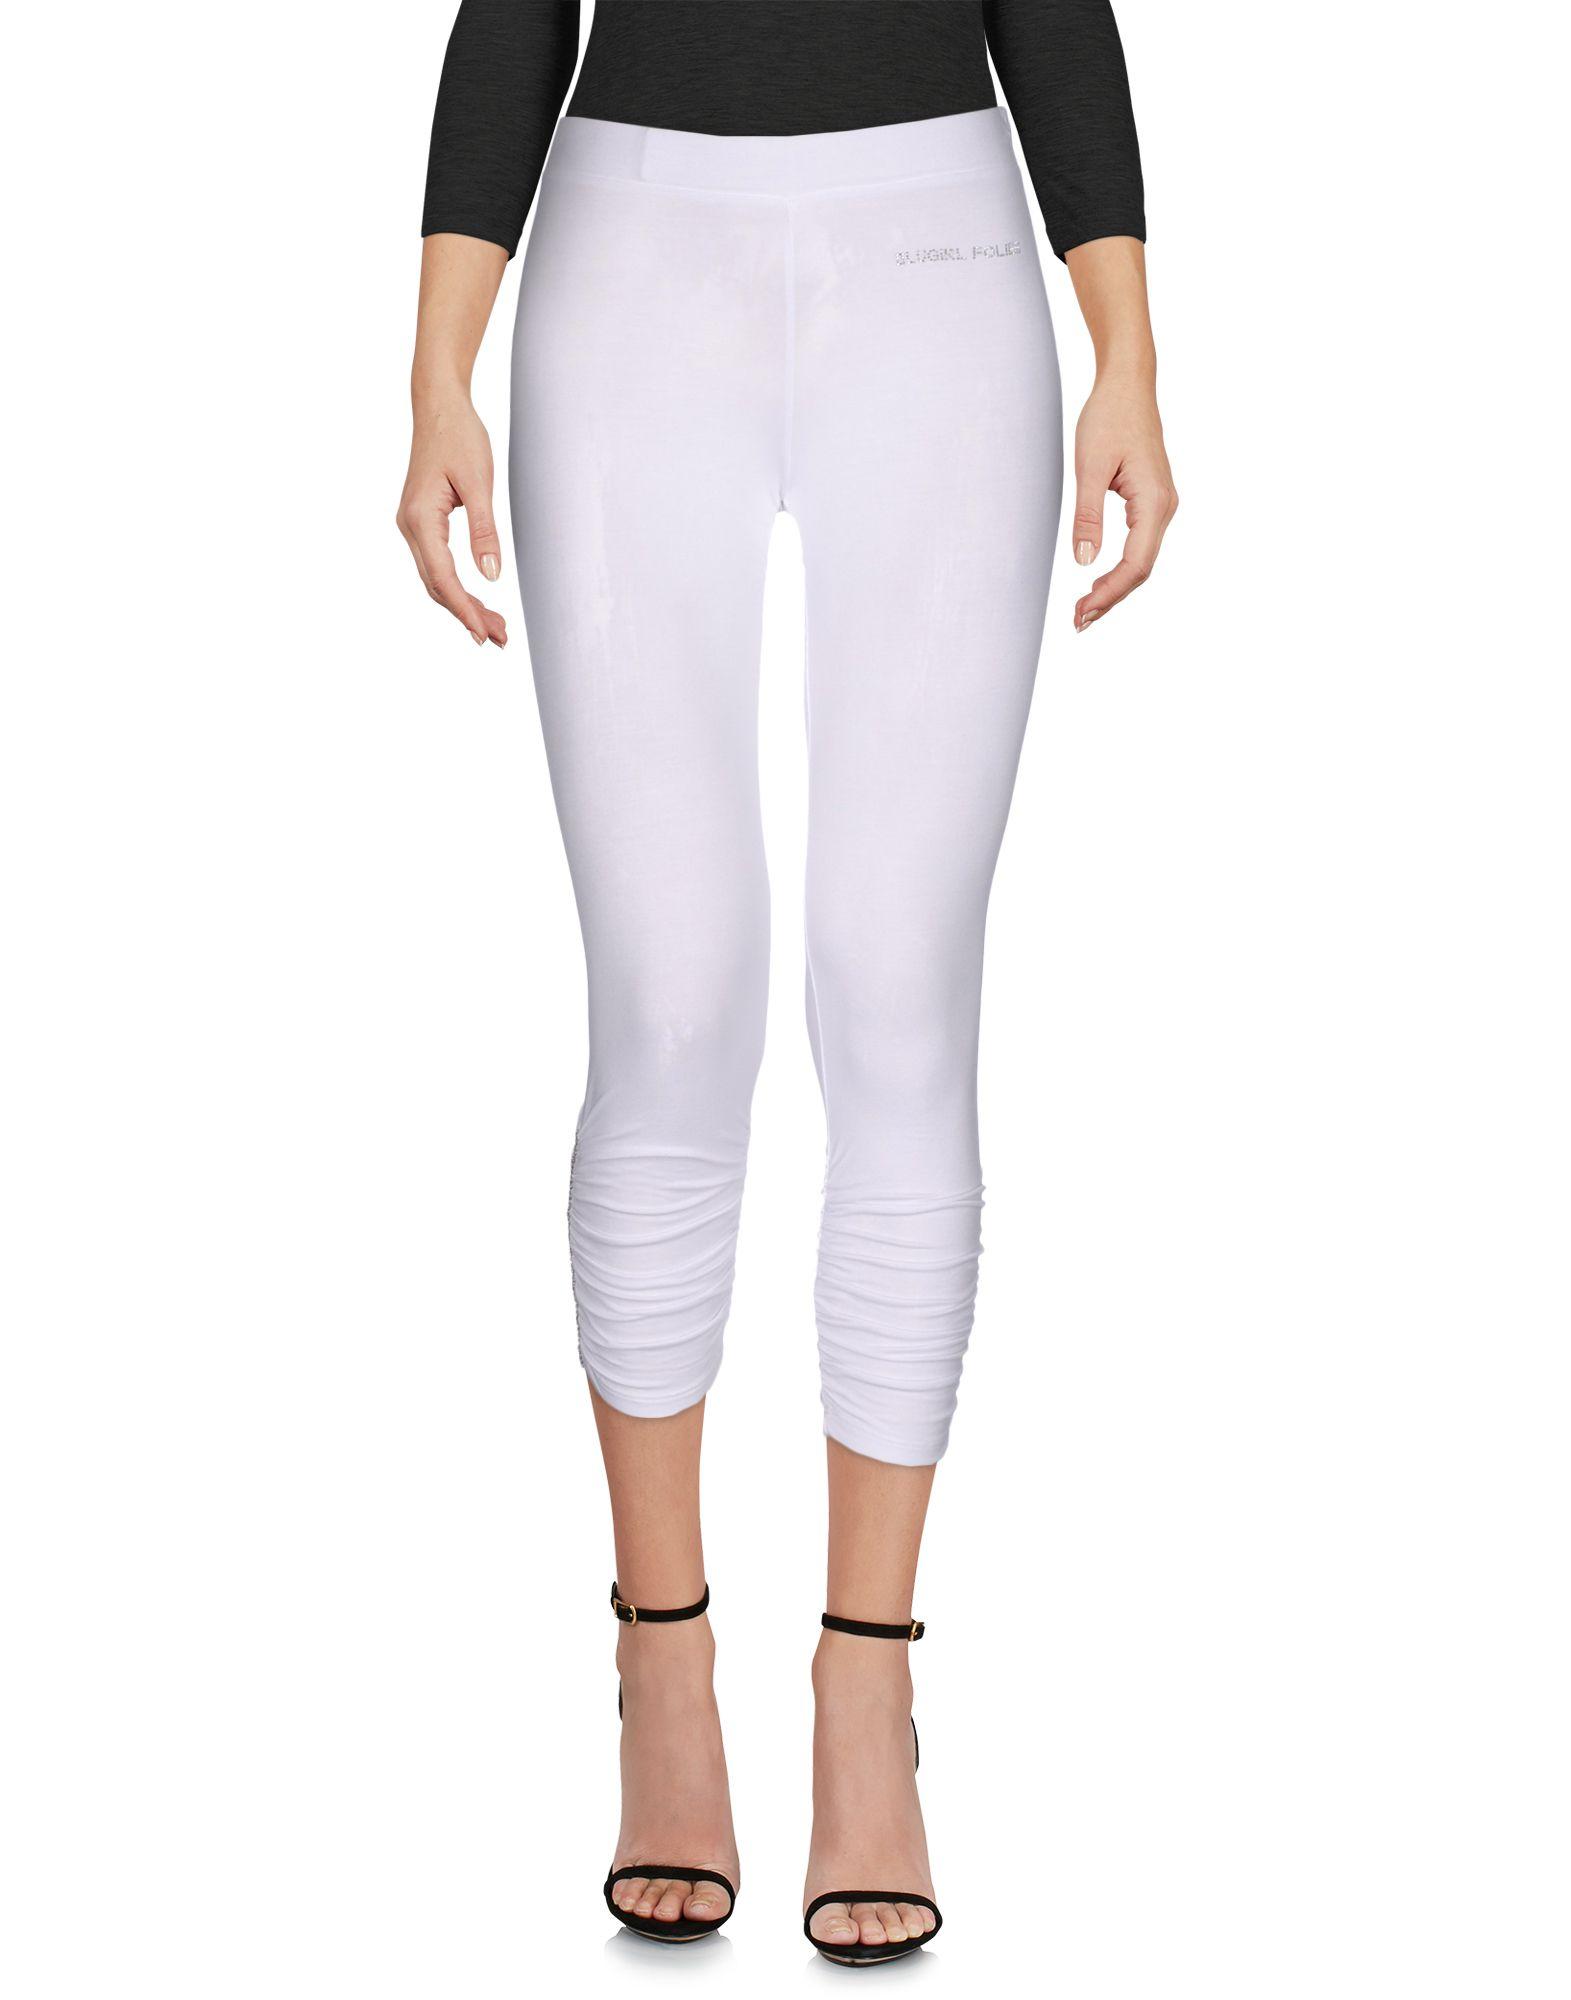 BLUGIRL FOLIES Damen Leggings Farbe Weiß Größe 2